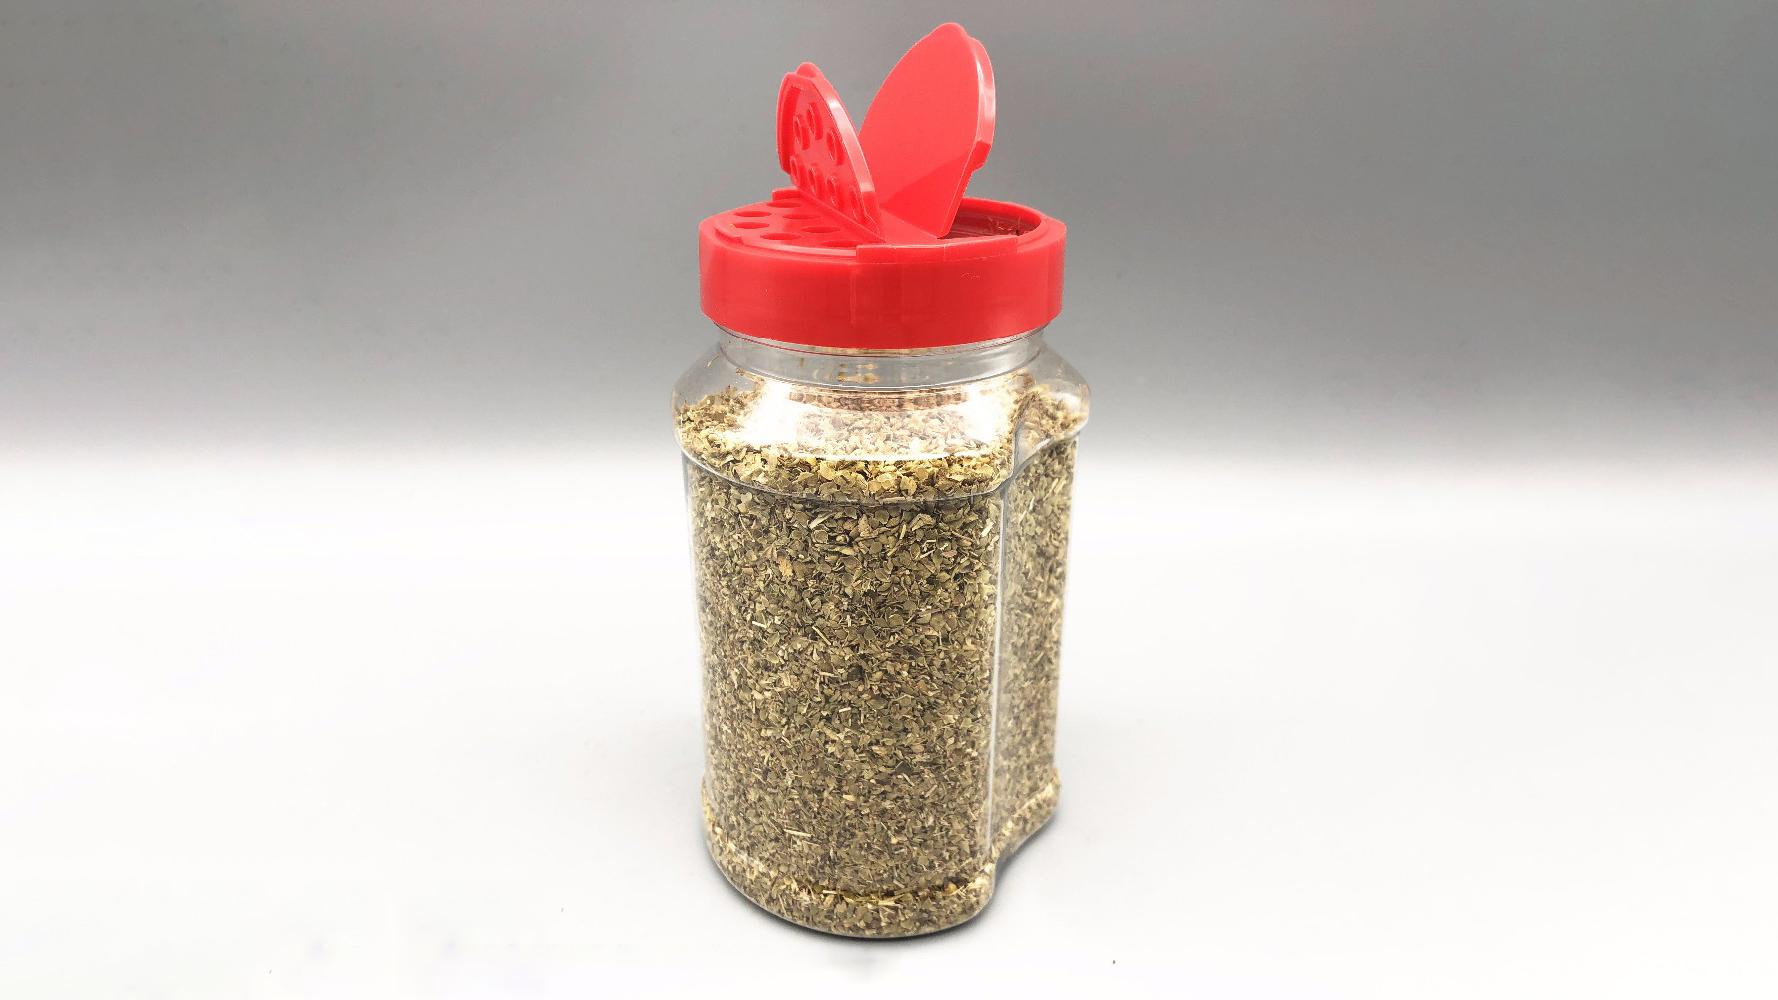 Bottiglia in plastica per agitatore di spezie da 500 ml per curry in polvere 1 acquirente